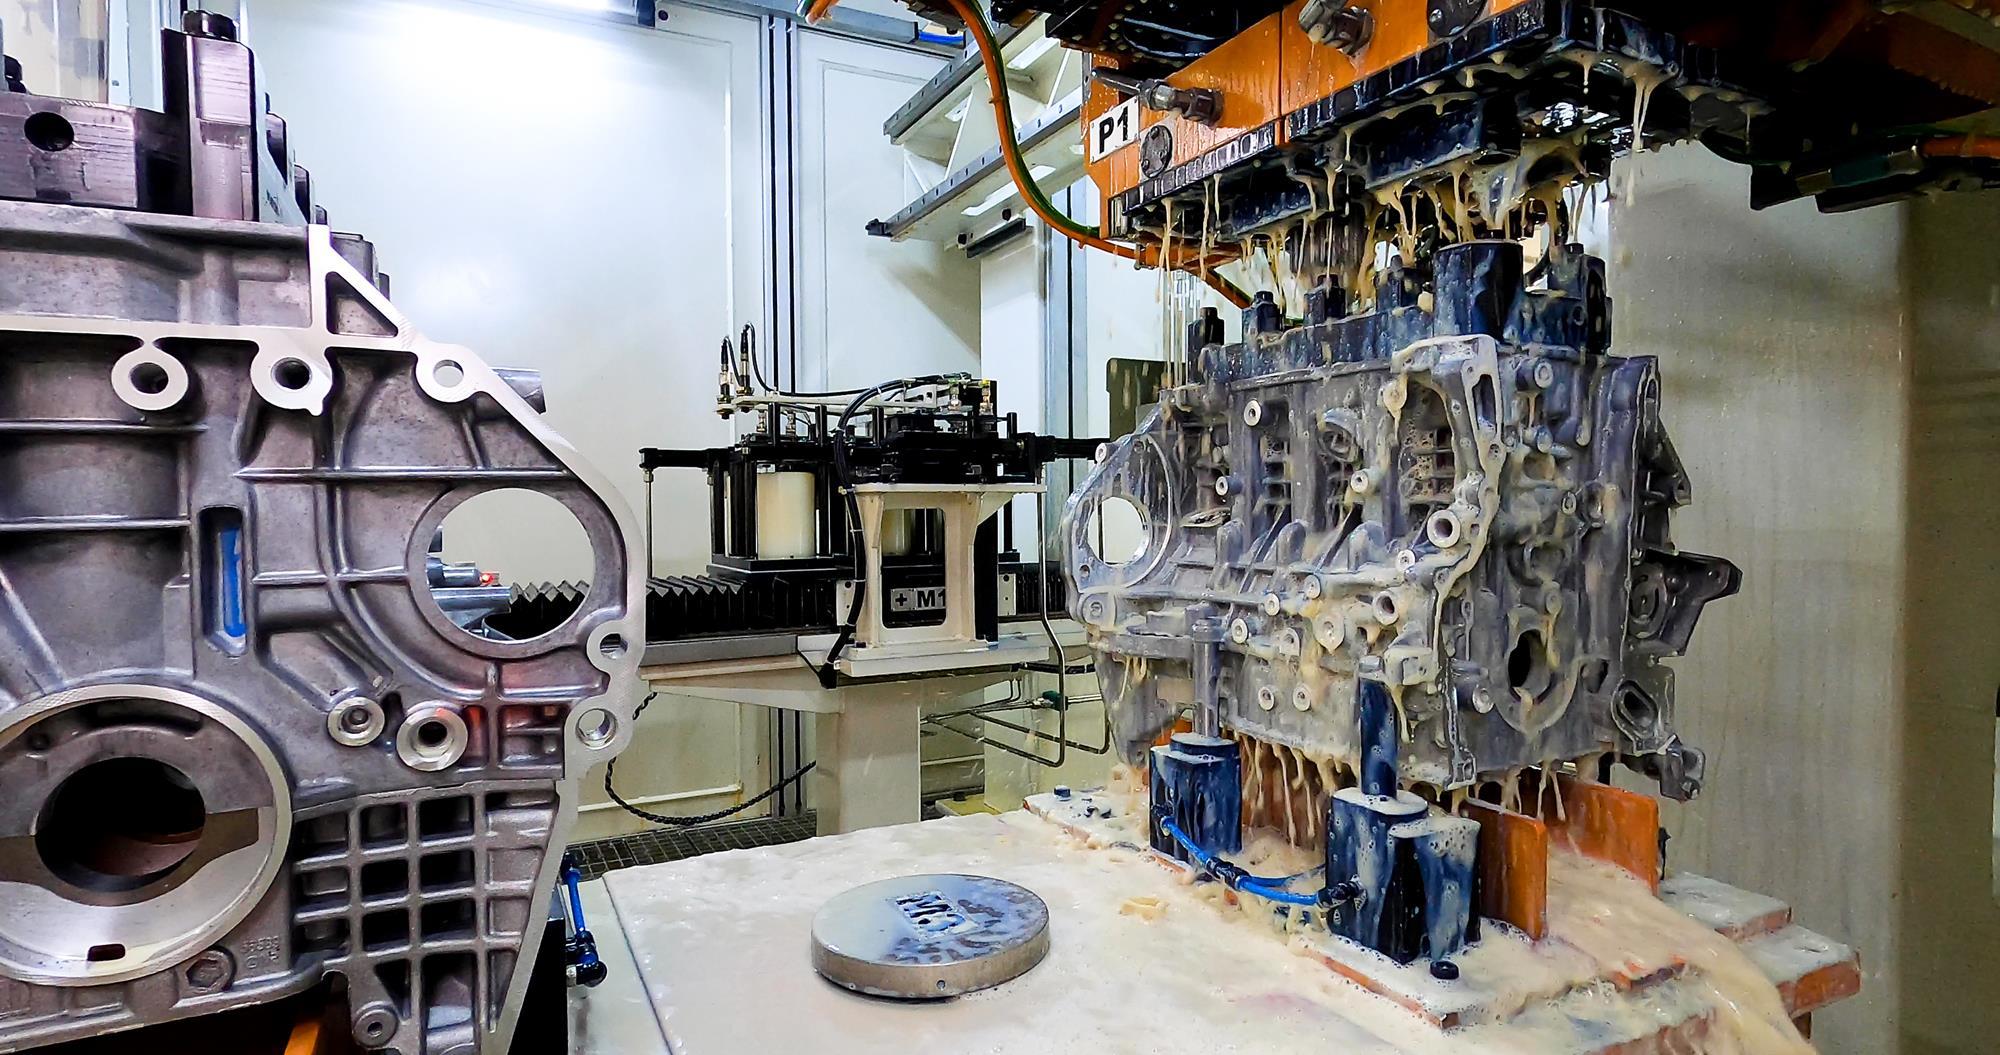 20210218-BETIM/MG - STELLANTIS- Motor GSE Turbo- Foto Leo Lara/Studio Cerri